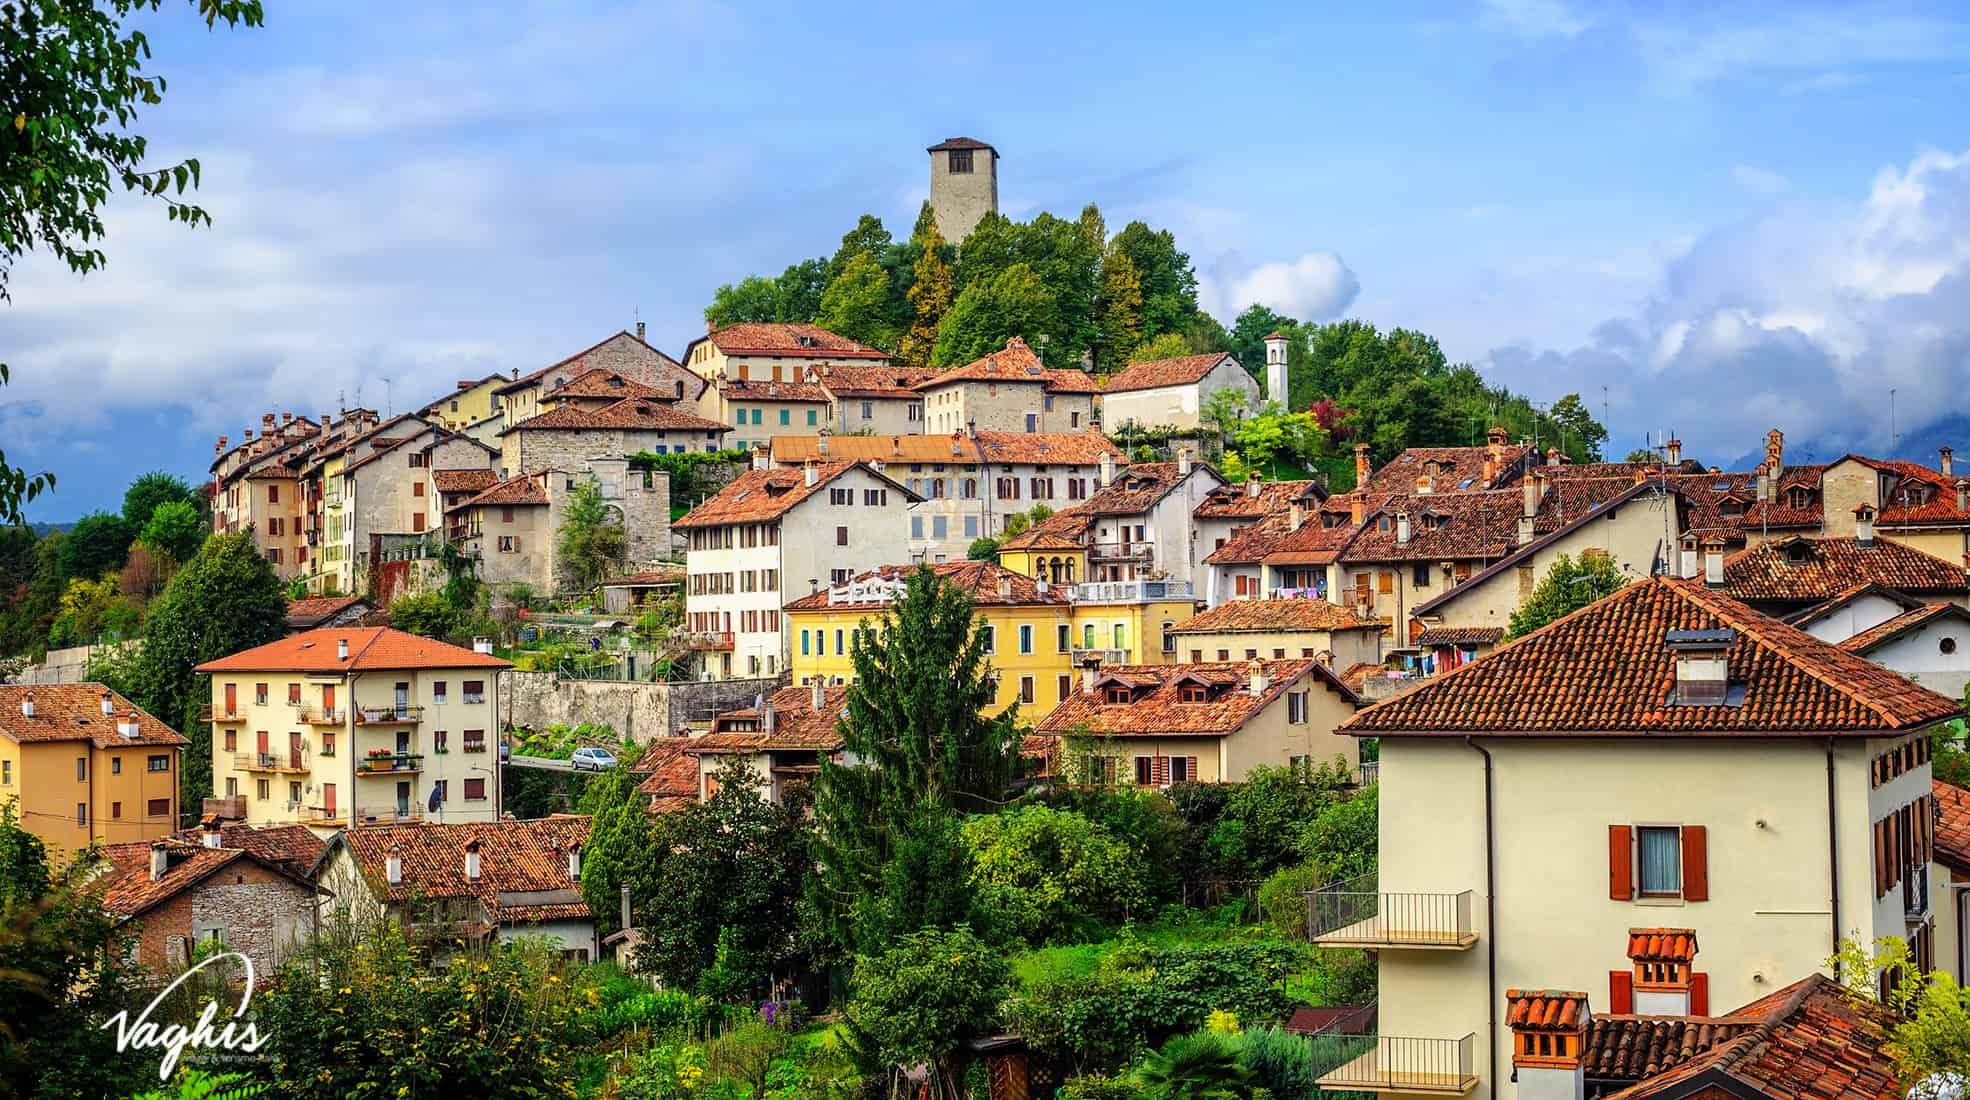 Feltre - © Vaghis - viaggi & turismo Italia - Tutti i diritti riservati